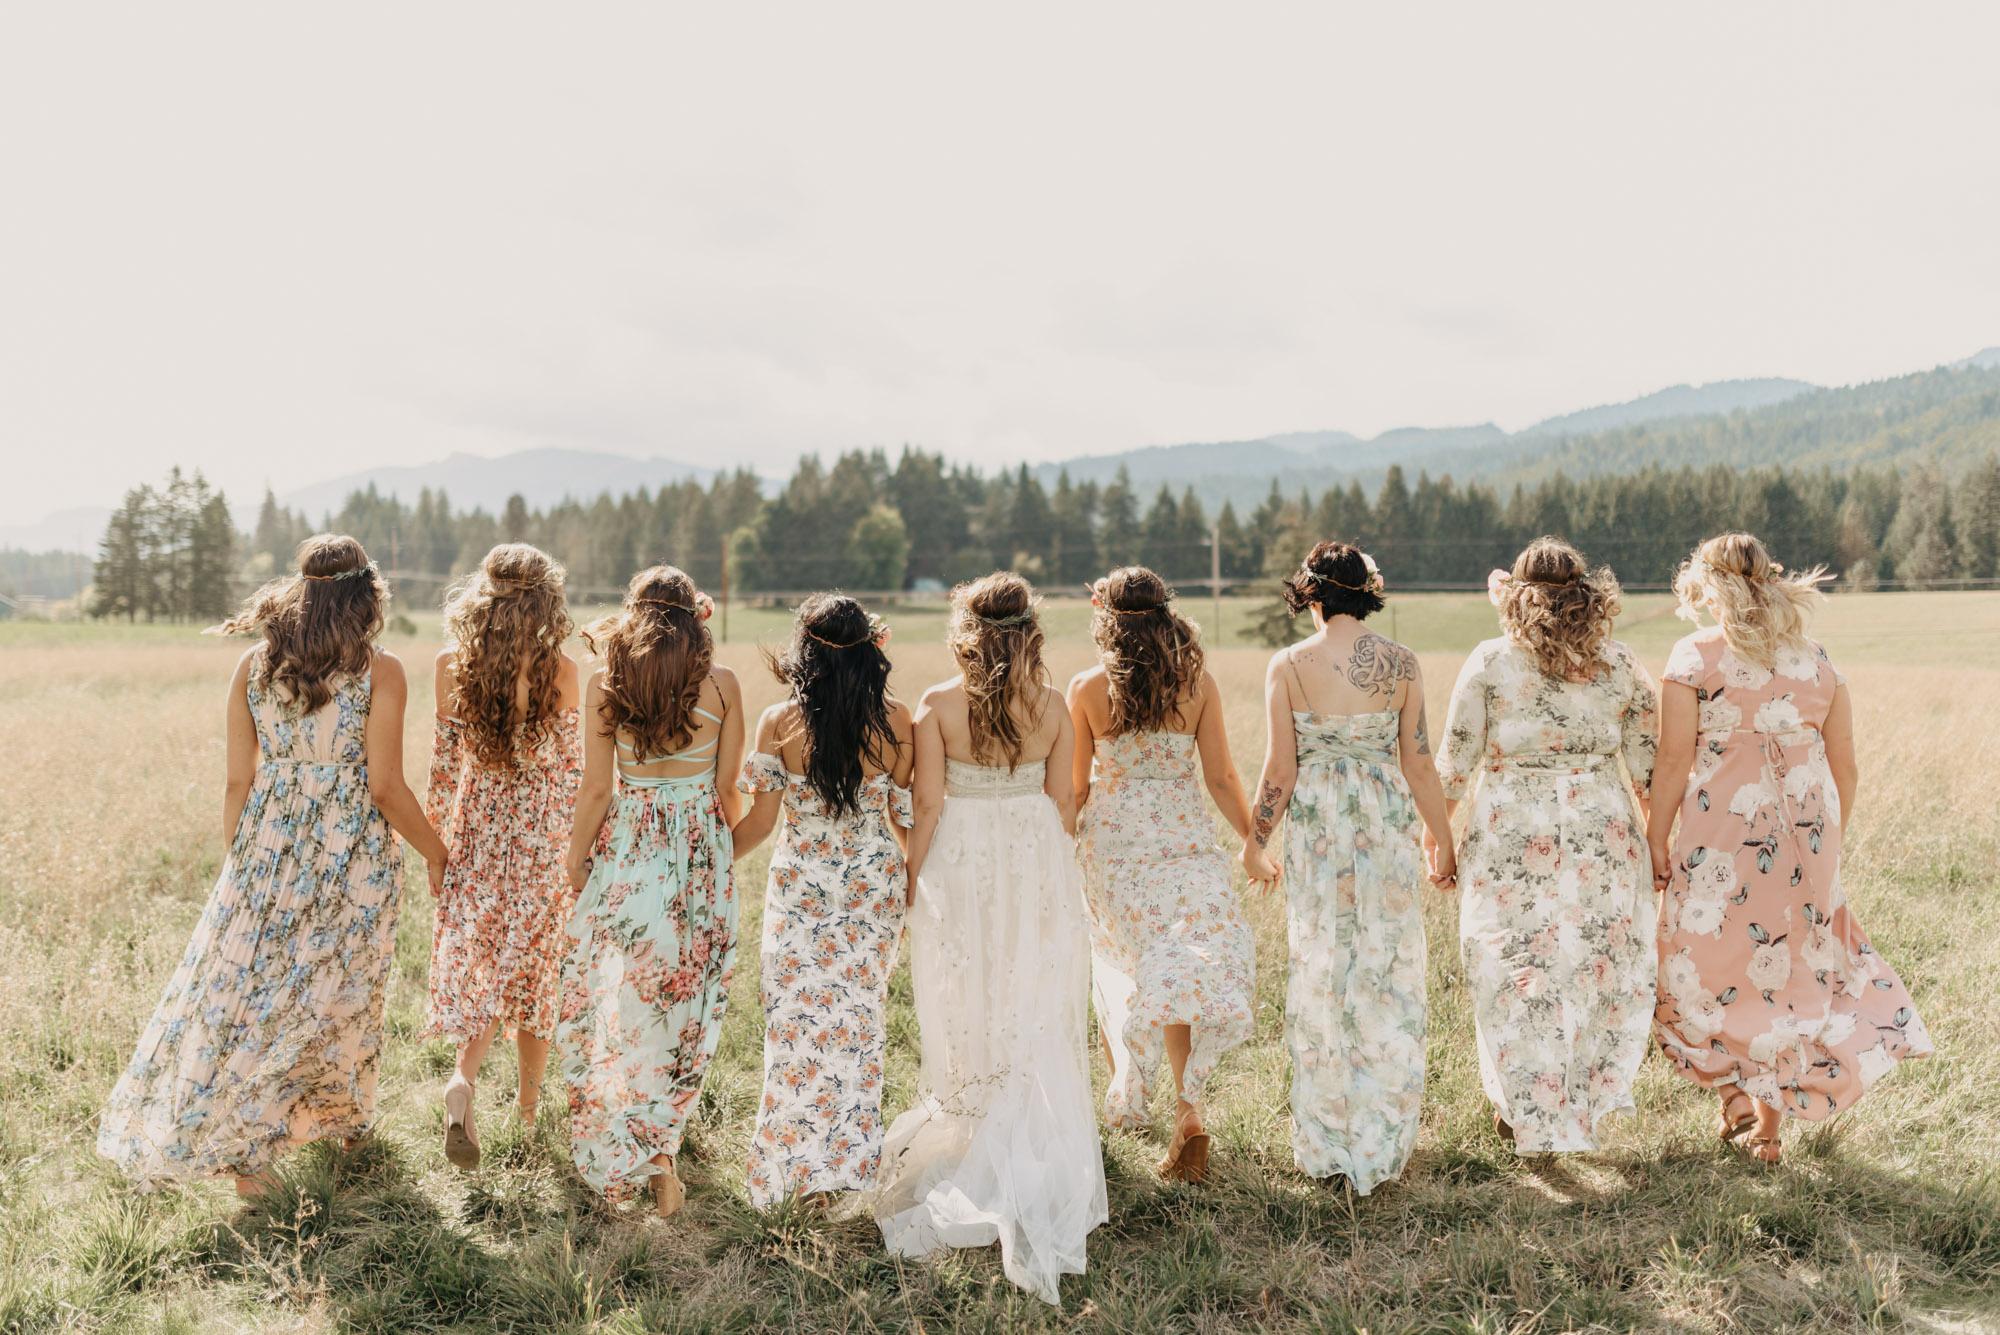 Bridal-Party-Free-People-Flower-Dresses-Washington-Wedding-8512.jpg